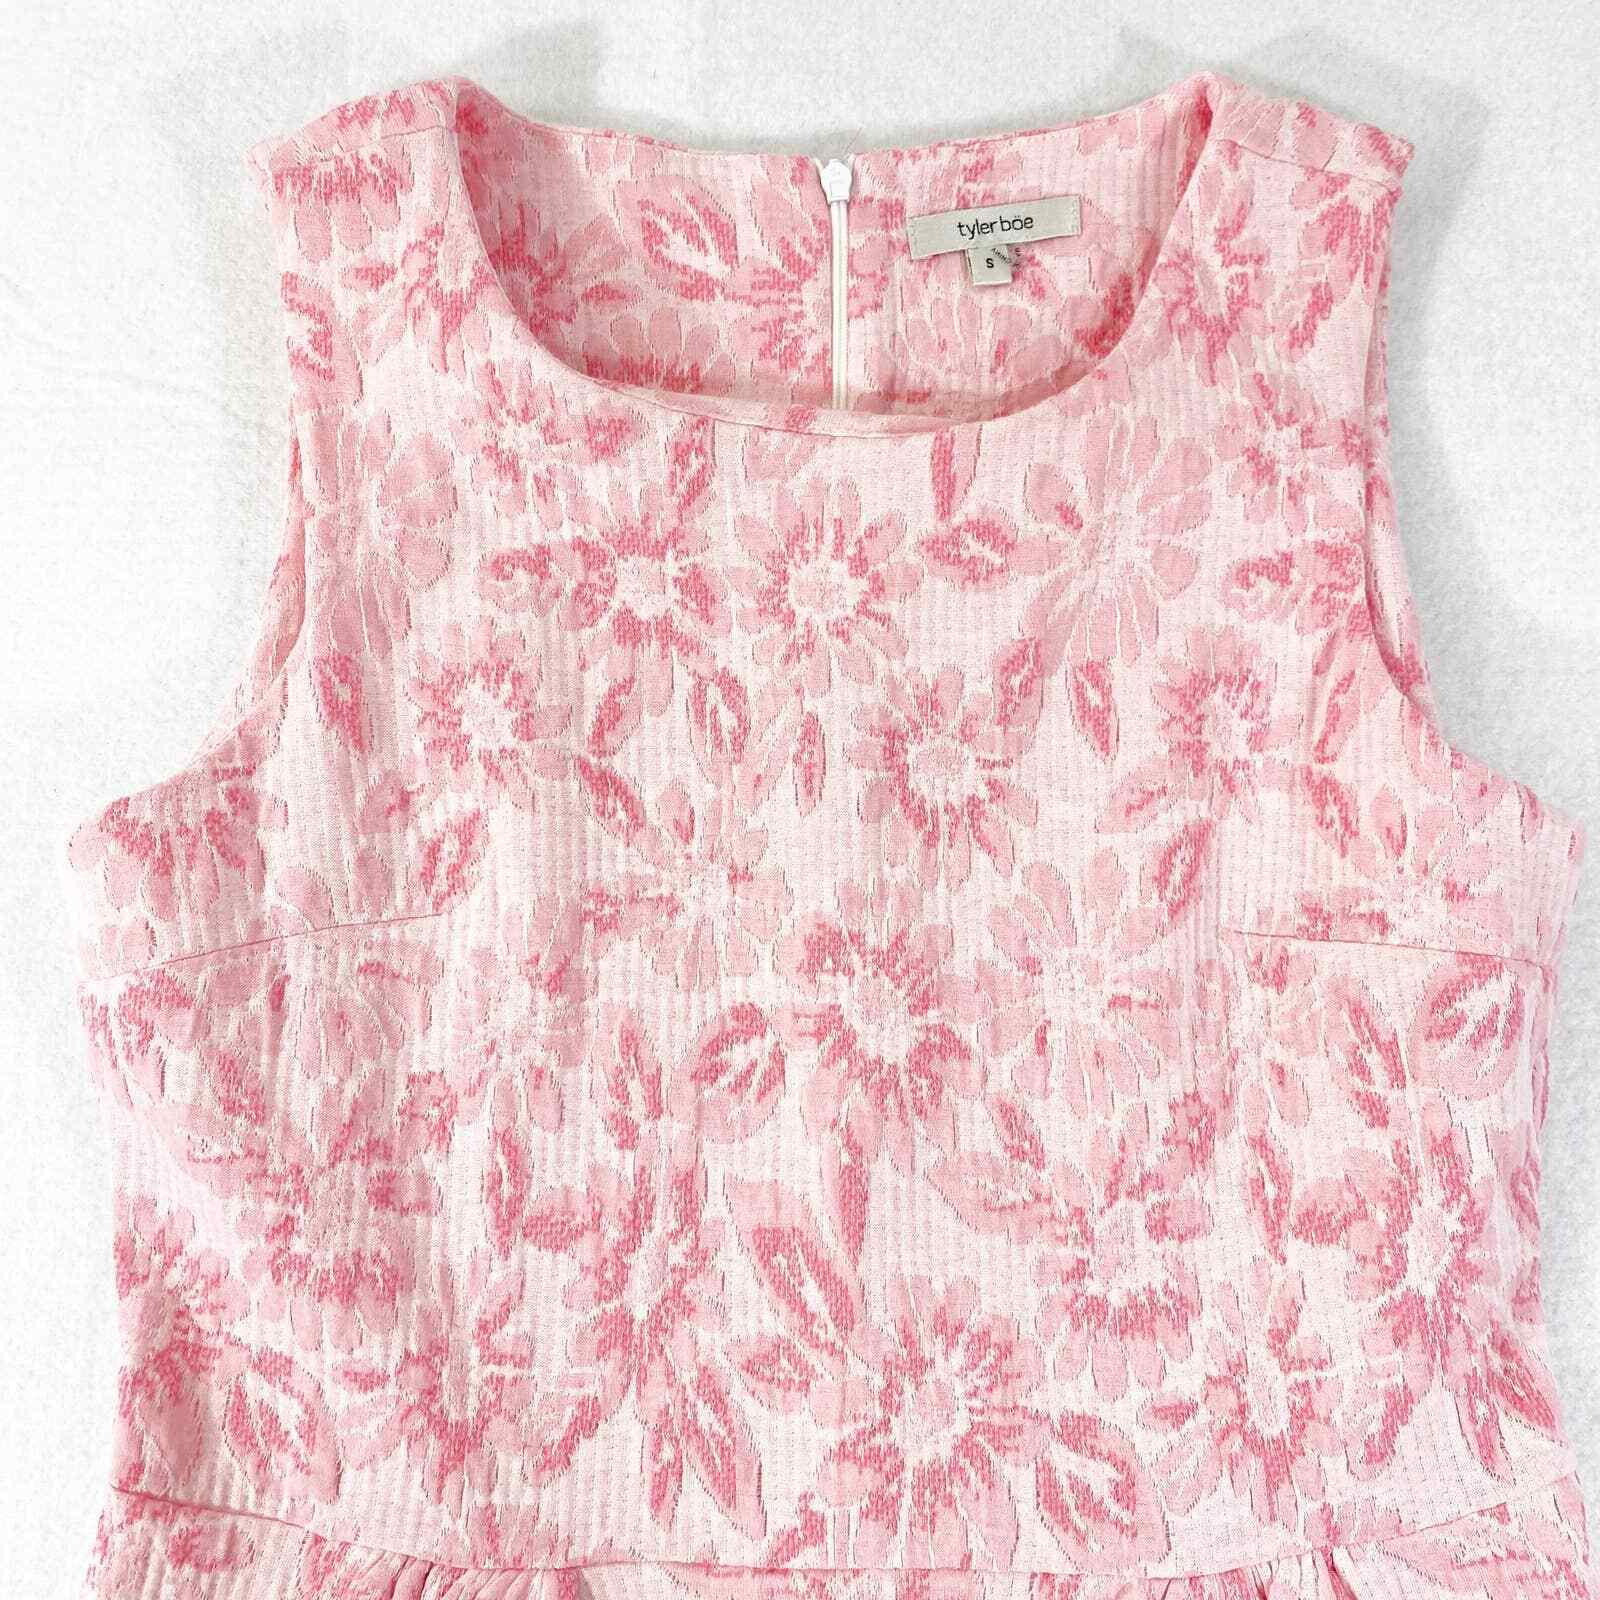 Tyler Boe Dress Small Womens Mini Pink Floral Kni… - image 3